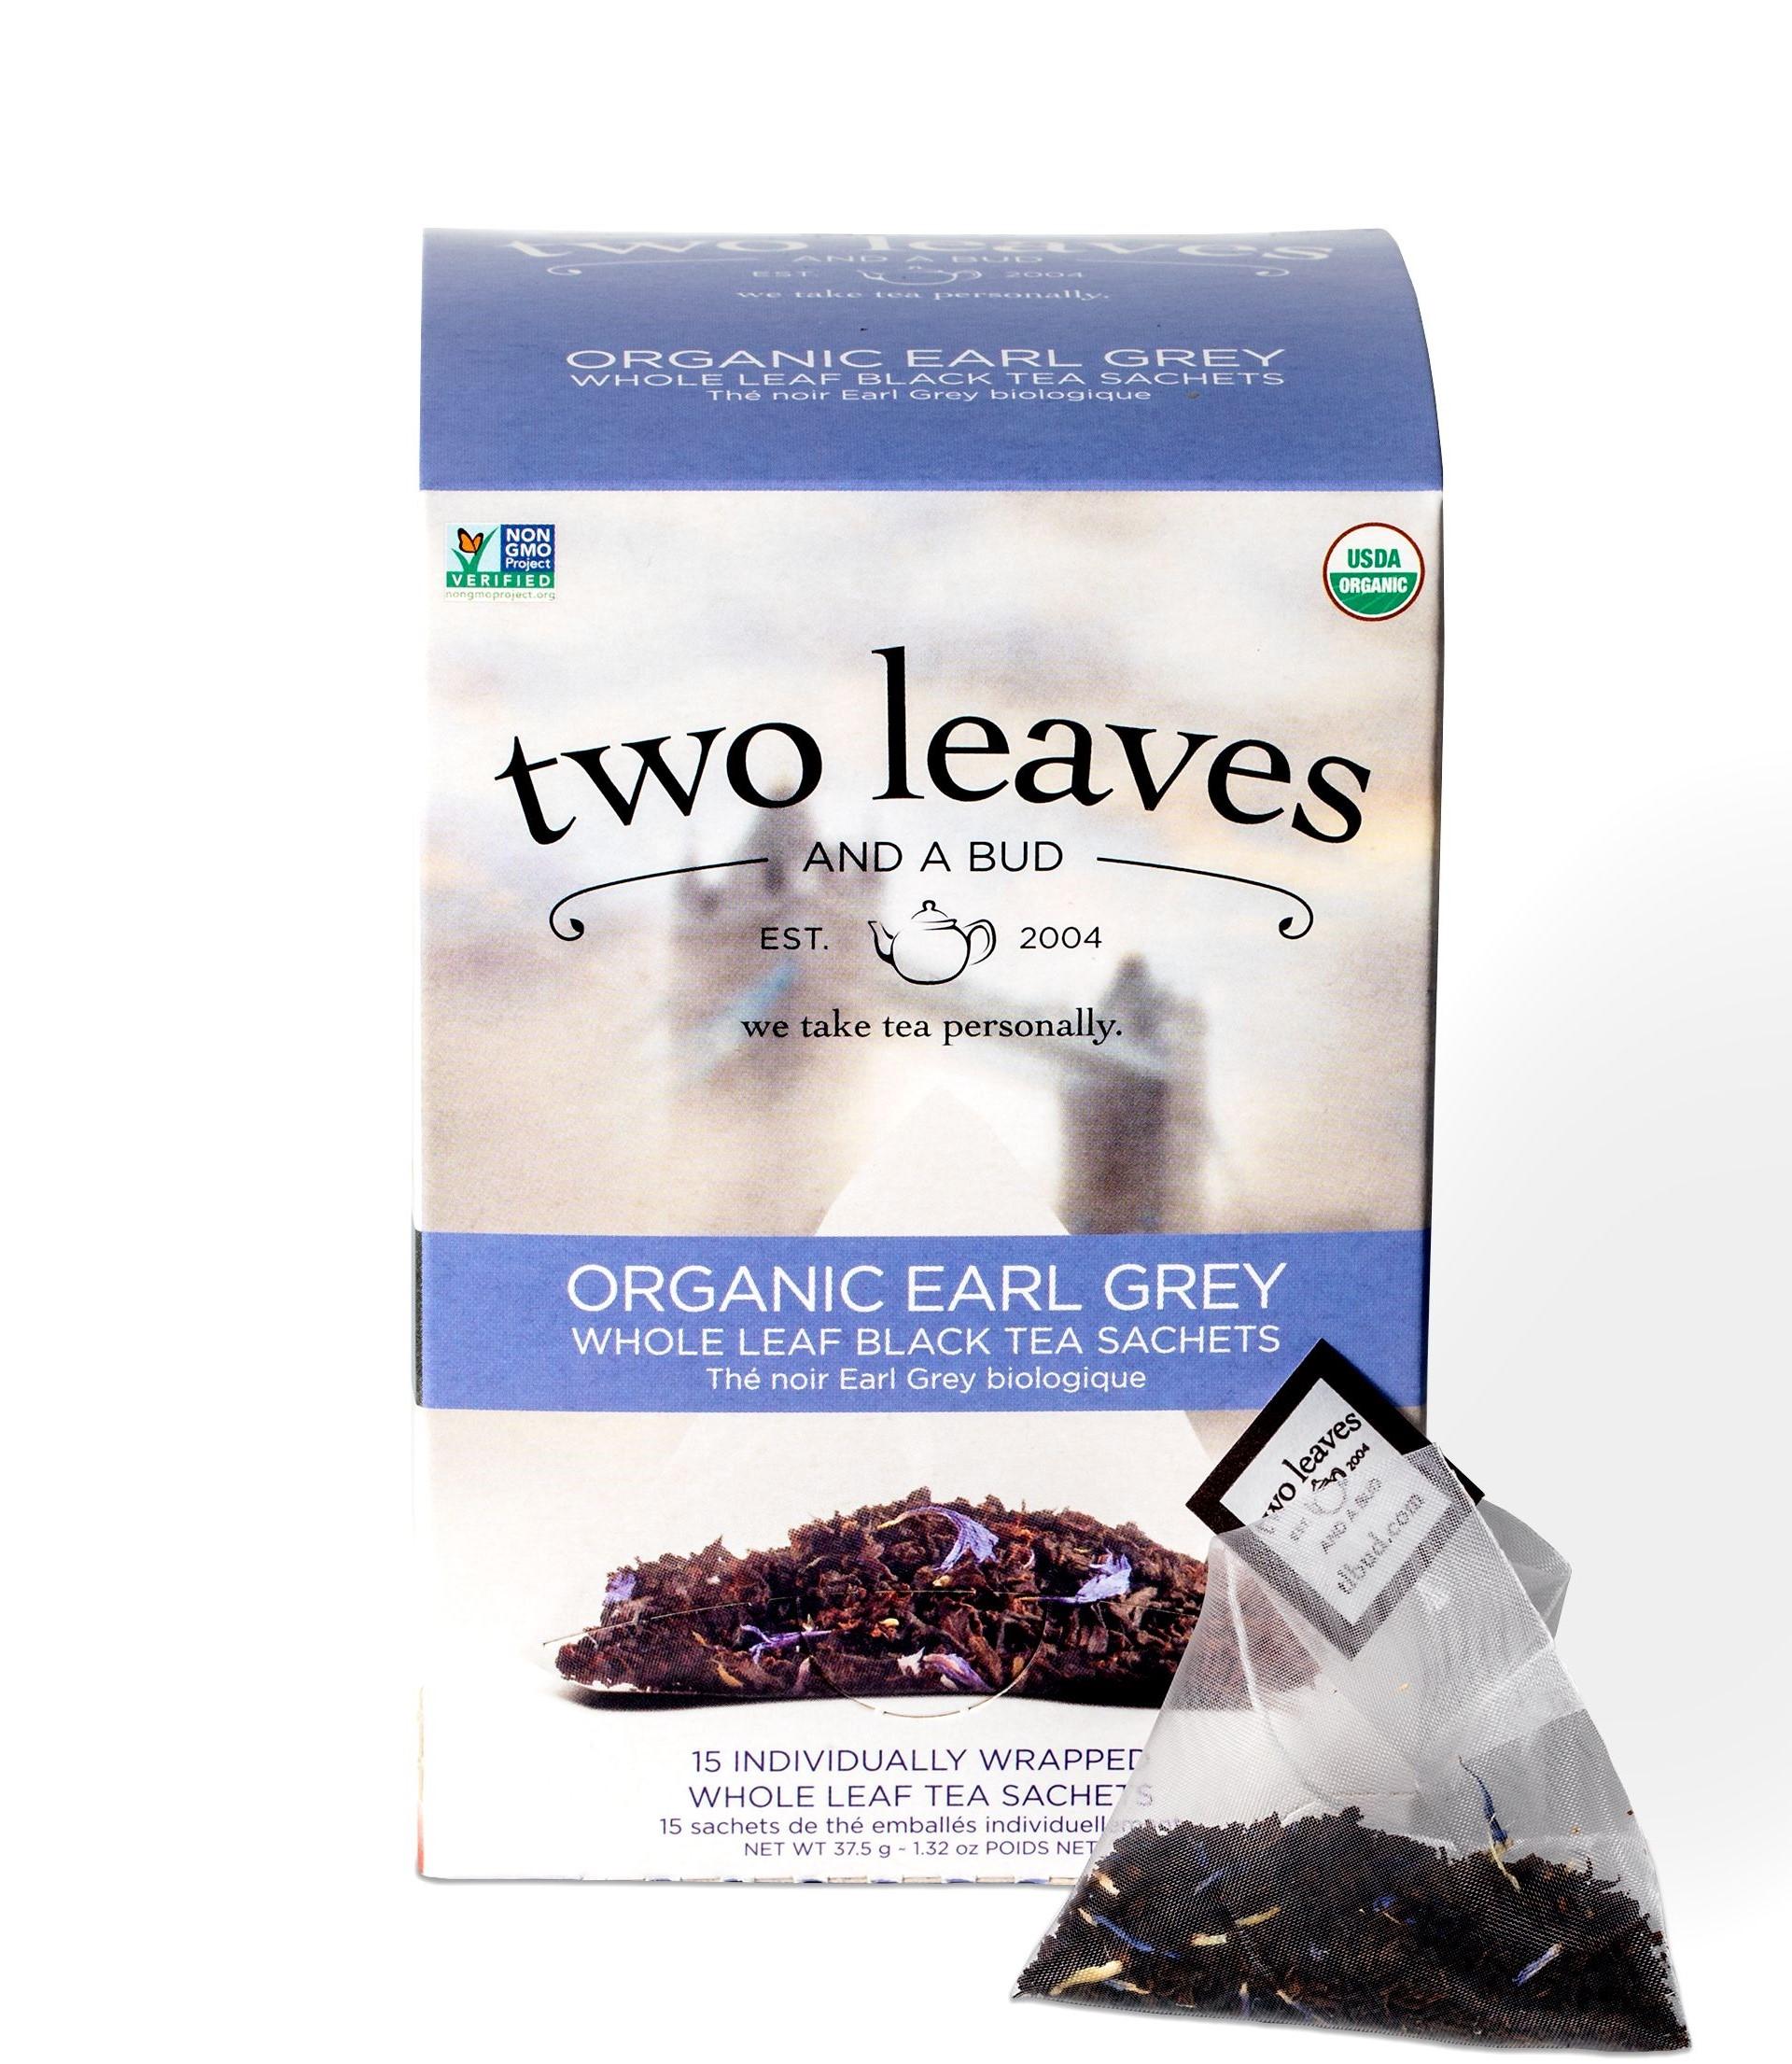 TEA: TWO LEAVES ORGANIC EARL GREY